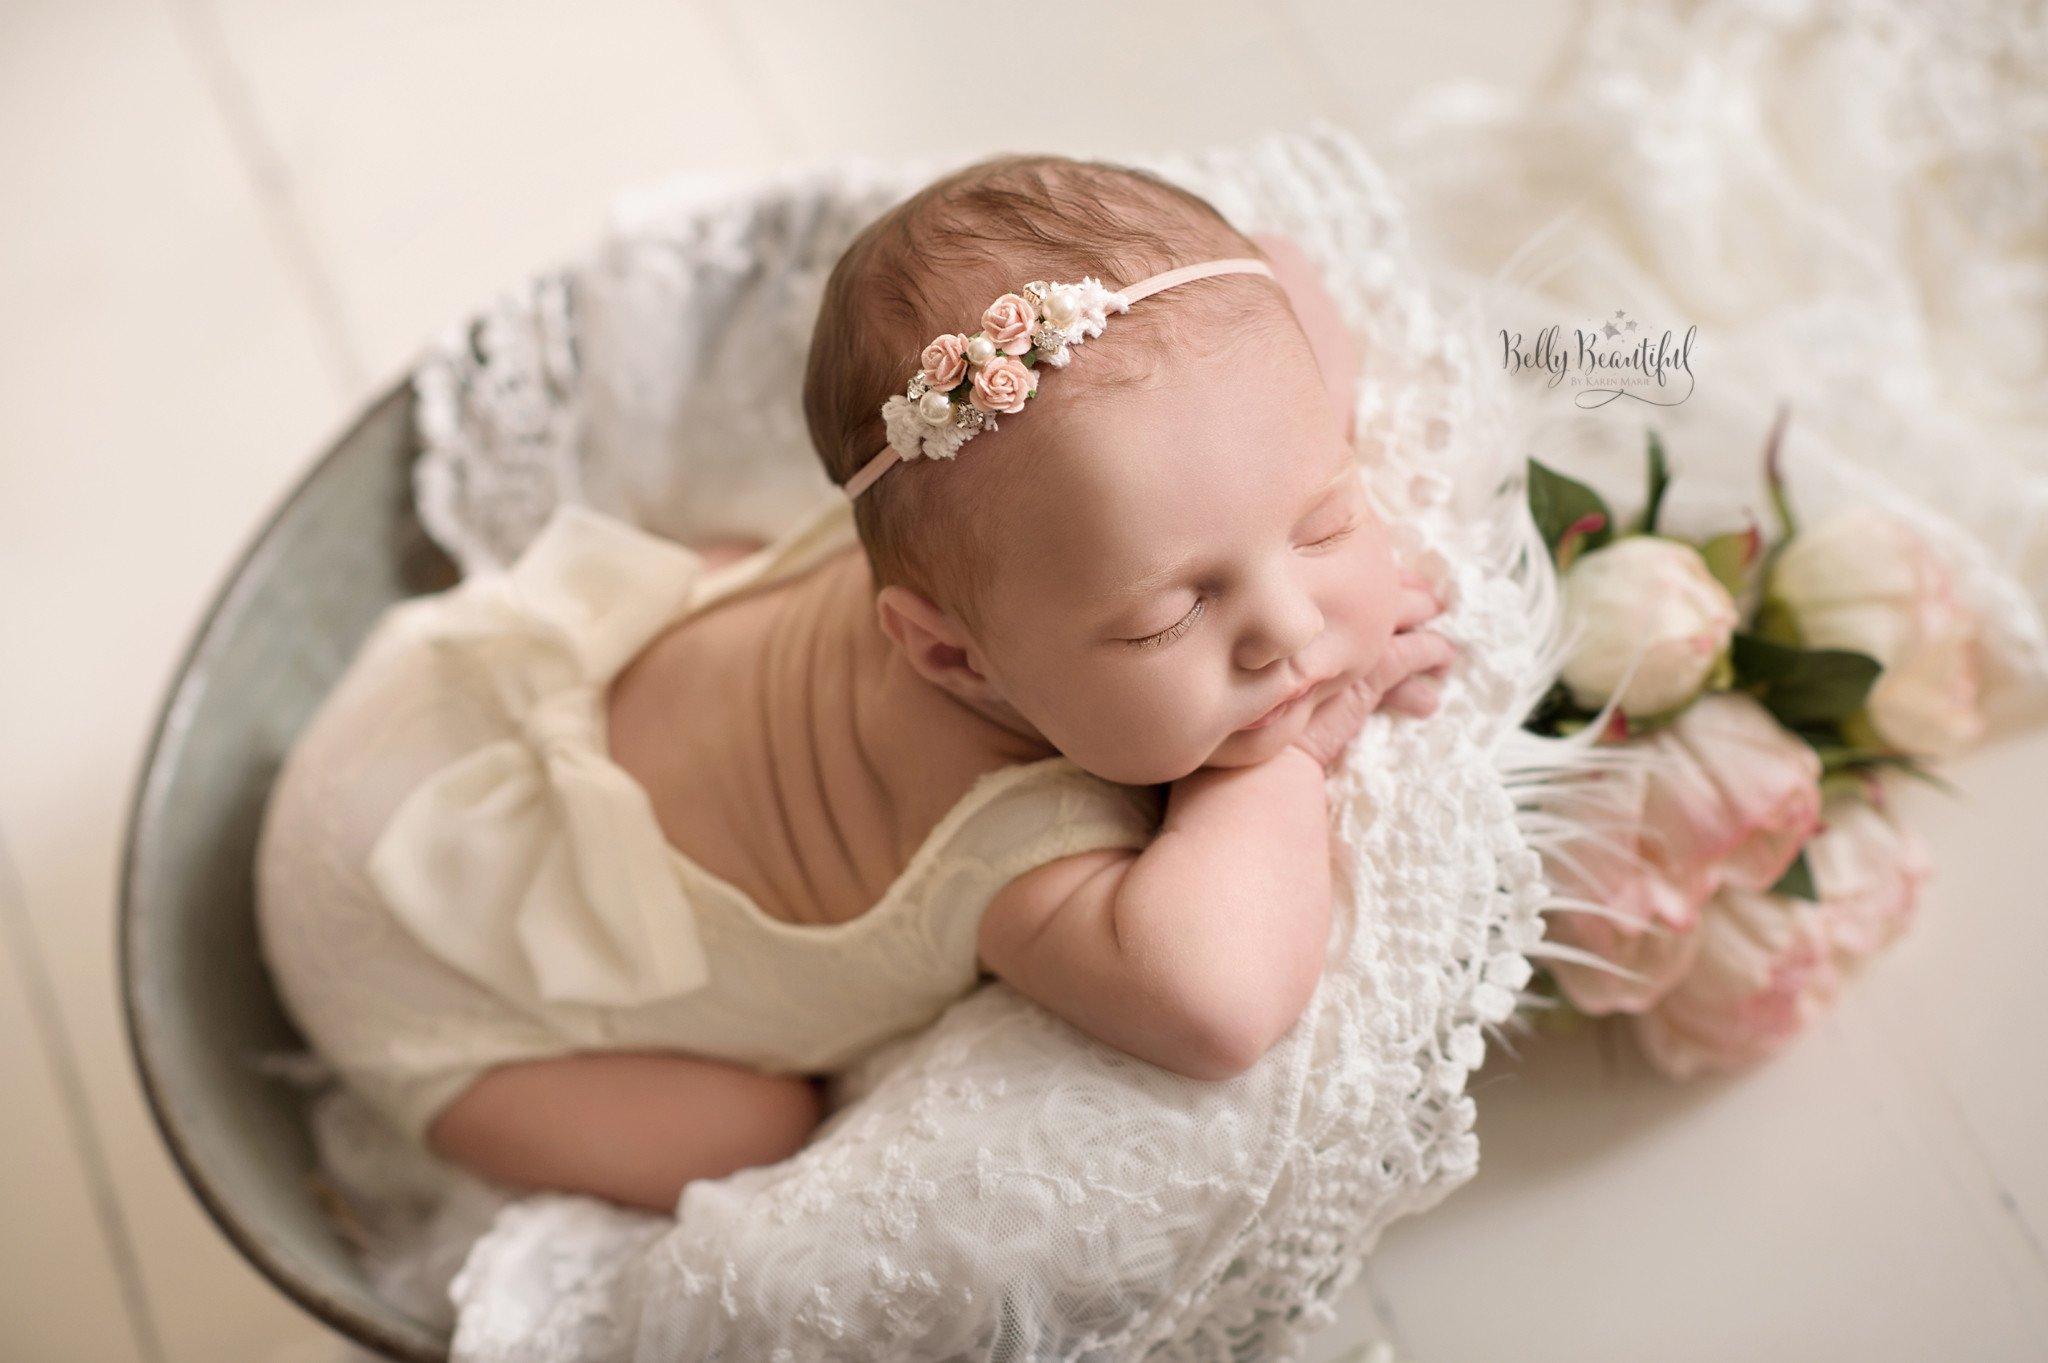 Newborn Chleo Ivory Belly Beautiful Sew Trendy 2400x image